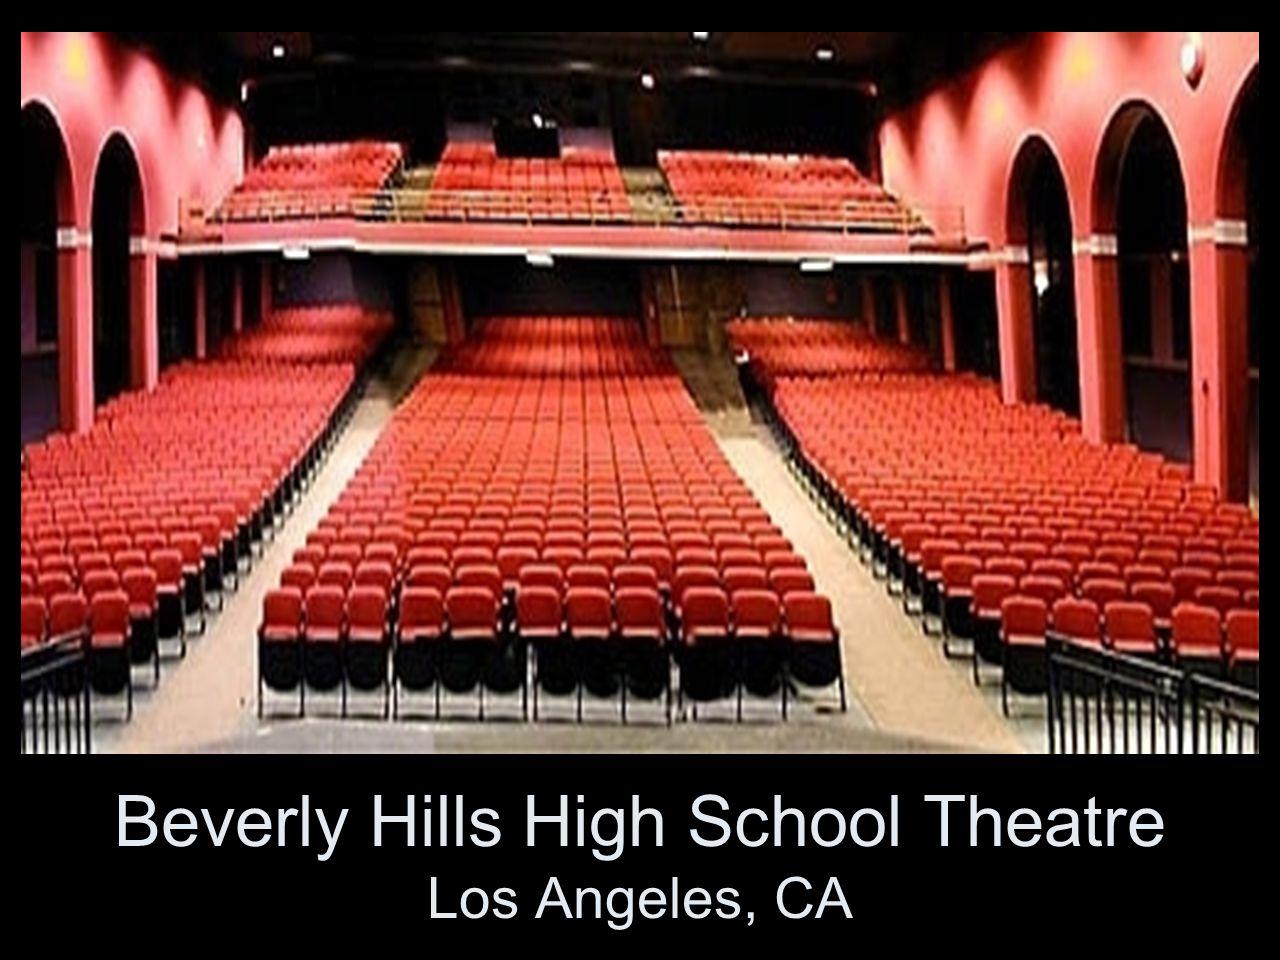 Beverly Hills High School Theatre Los Angeles, CA